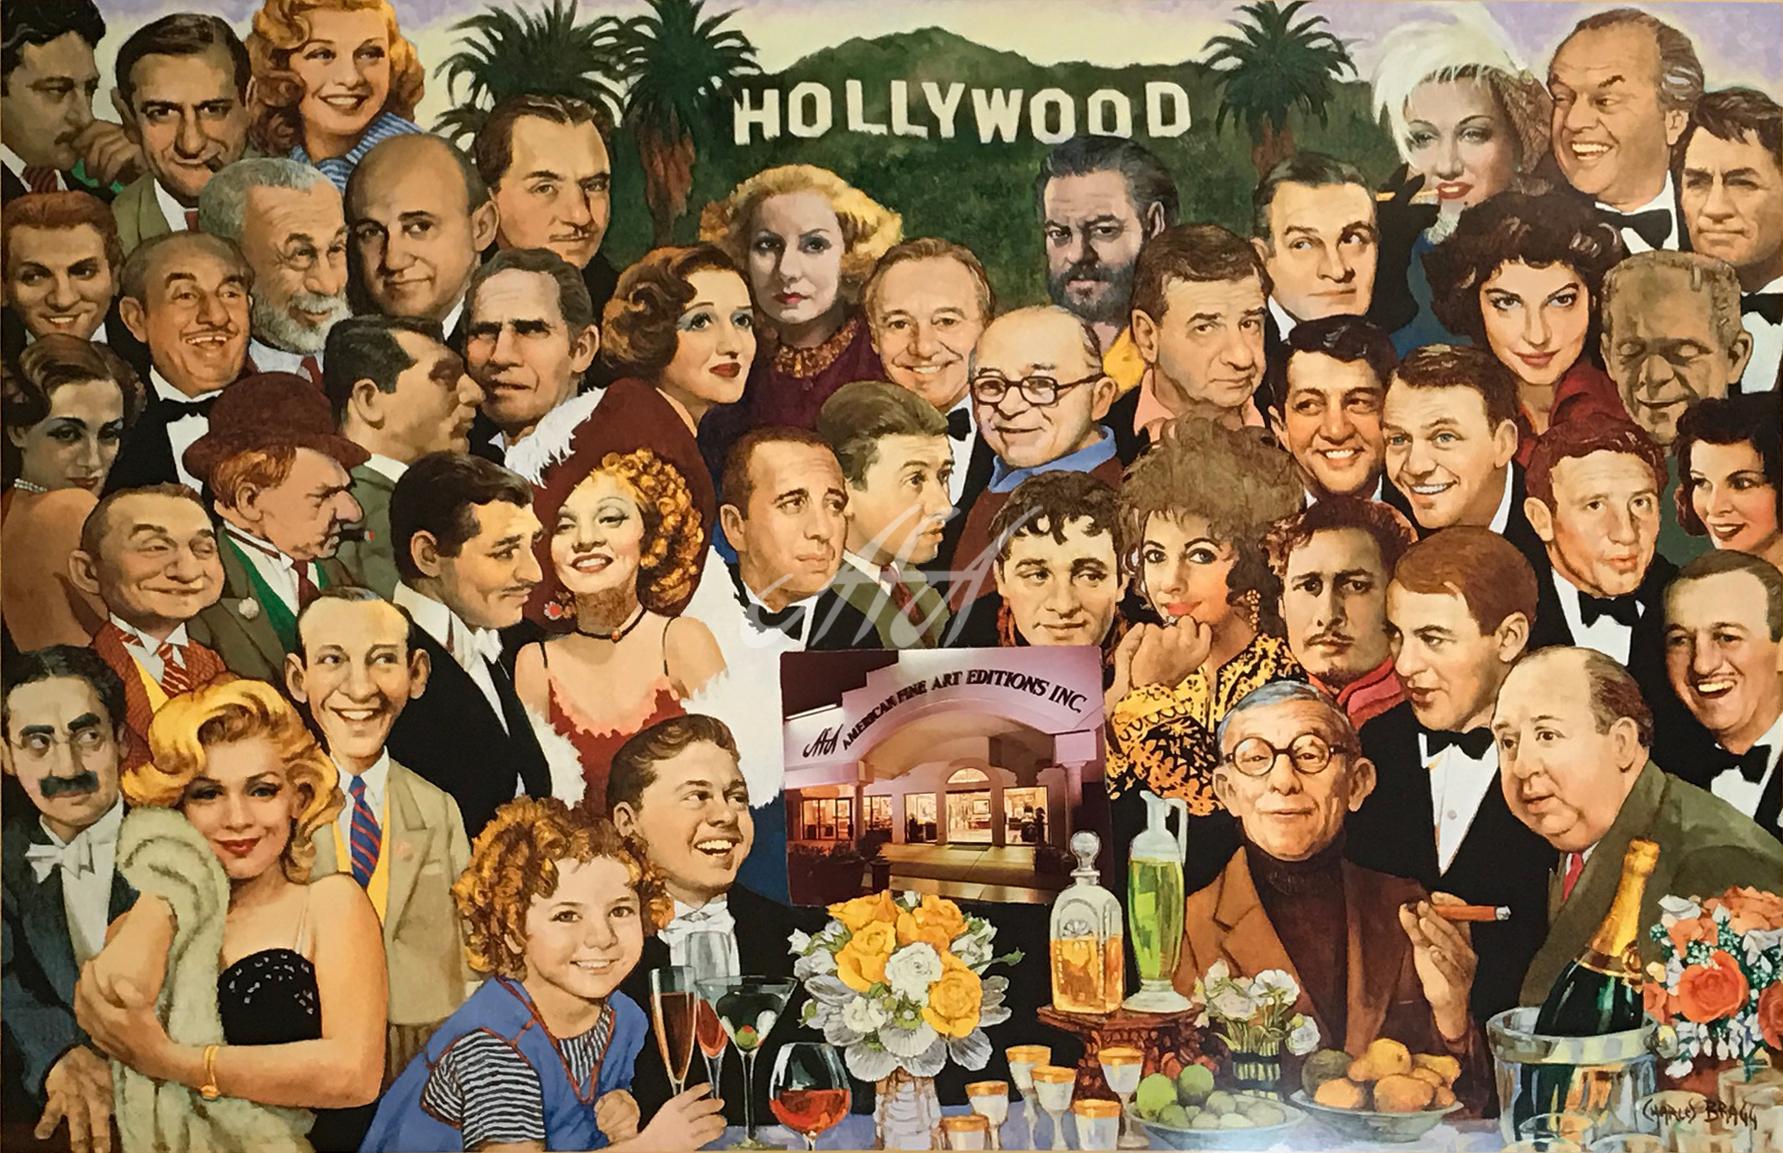 Bragg_Hollywood watermark.jpg